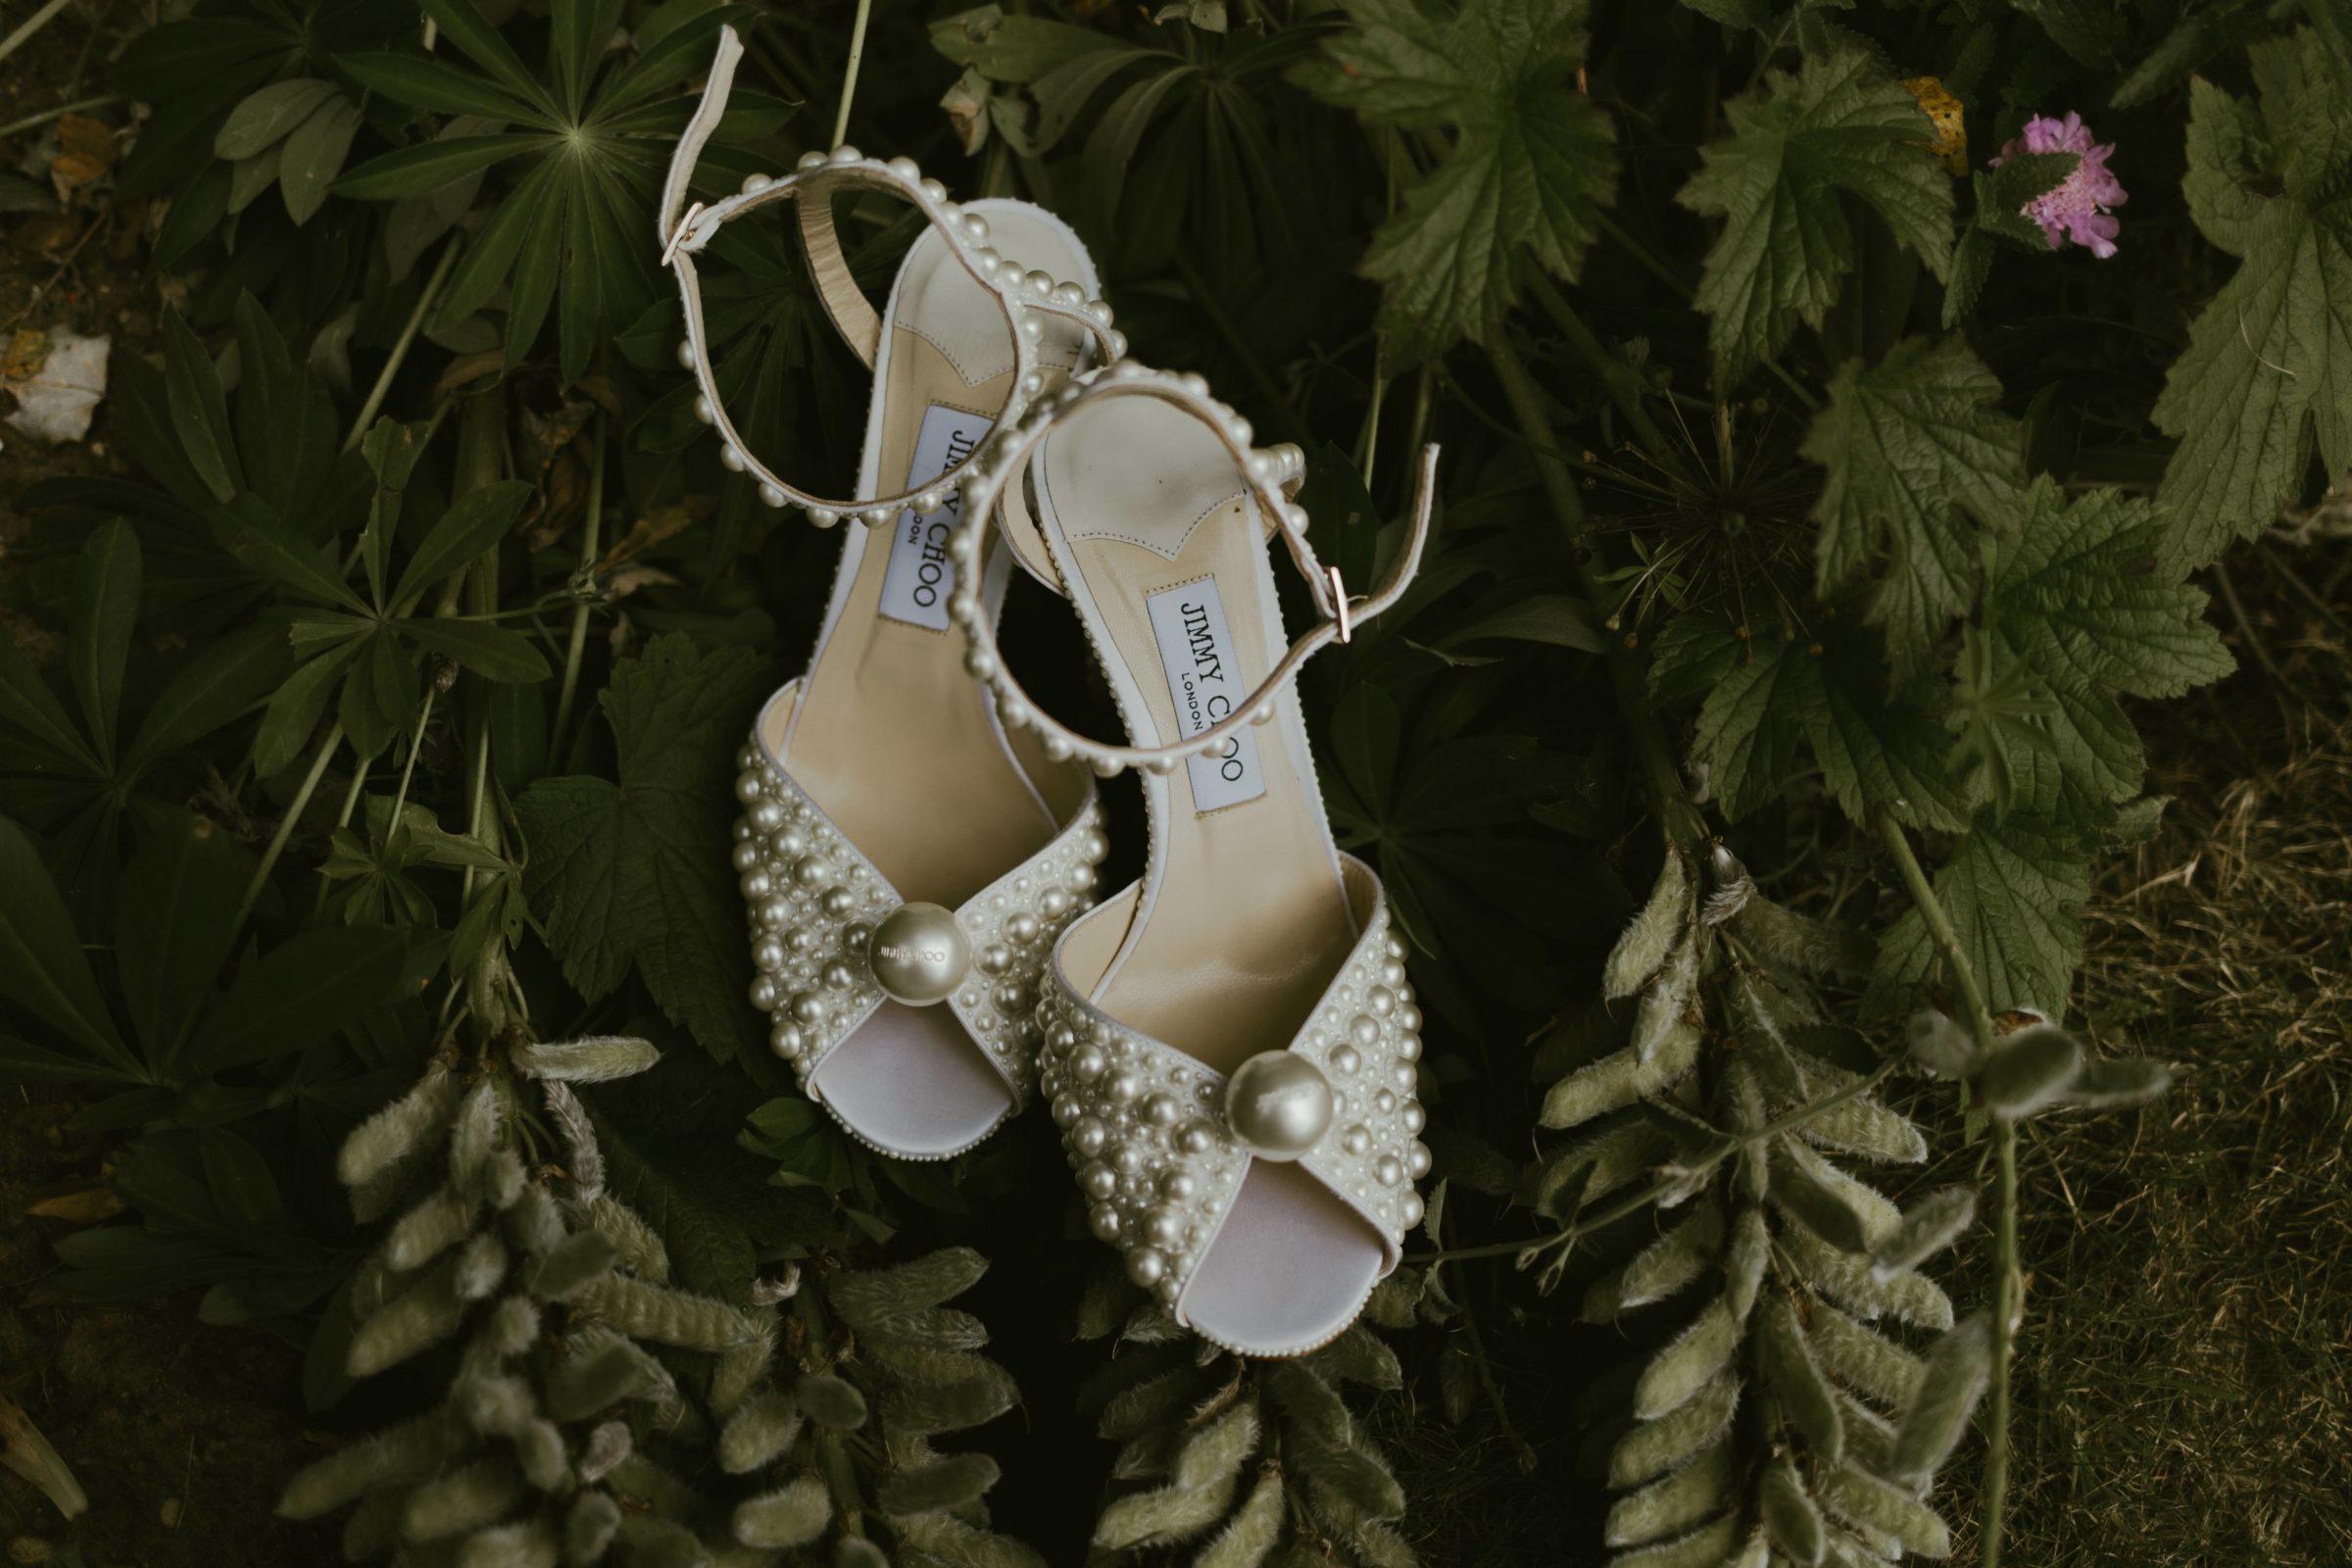 millbridge-court-wedding-venue-frensham-surrey-uk-photography-photographer-jimmy-choo-shoes-details